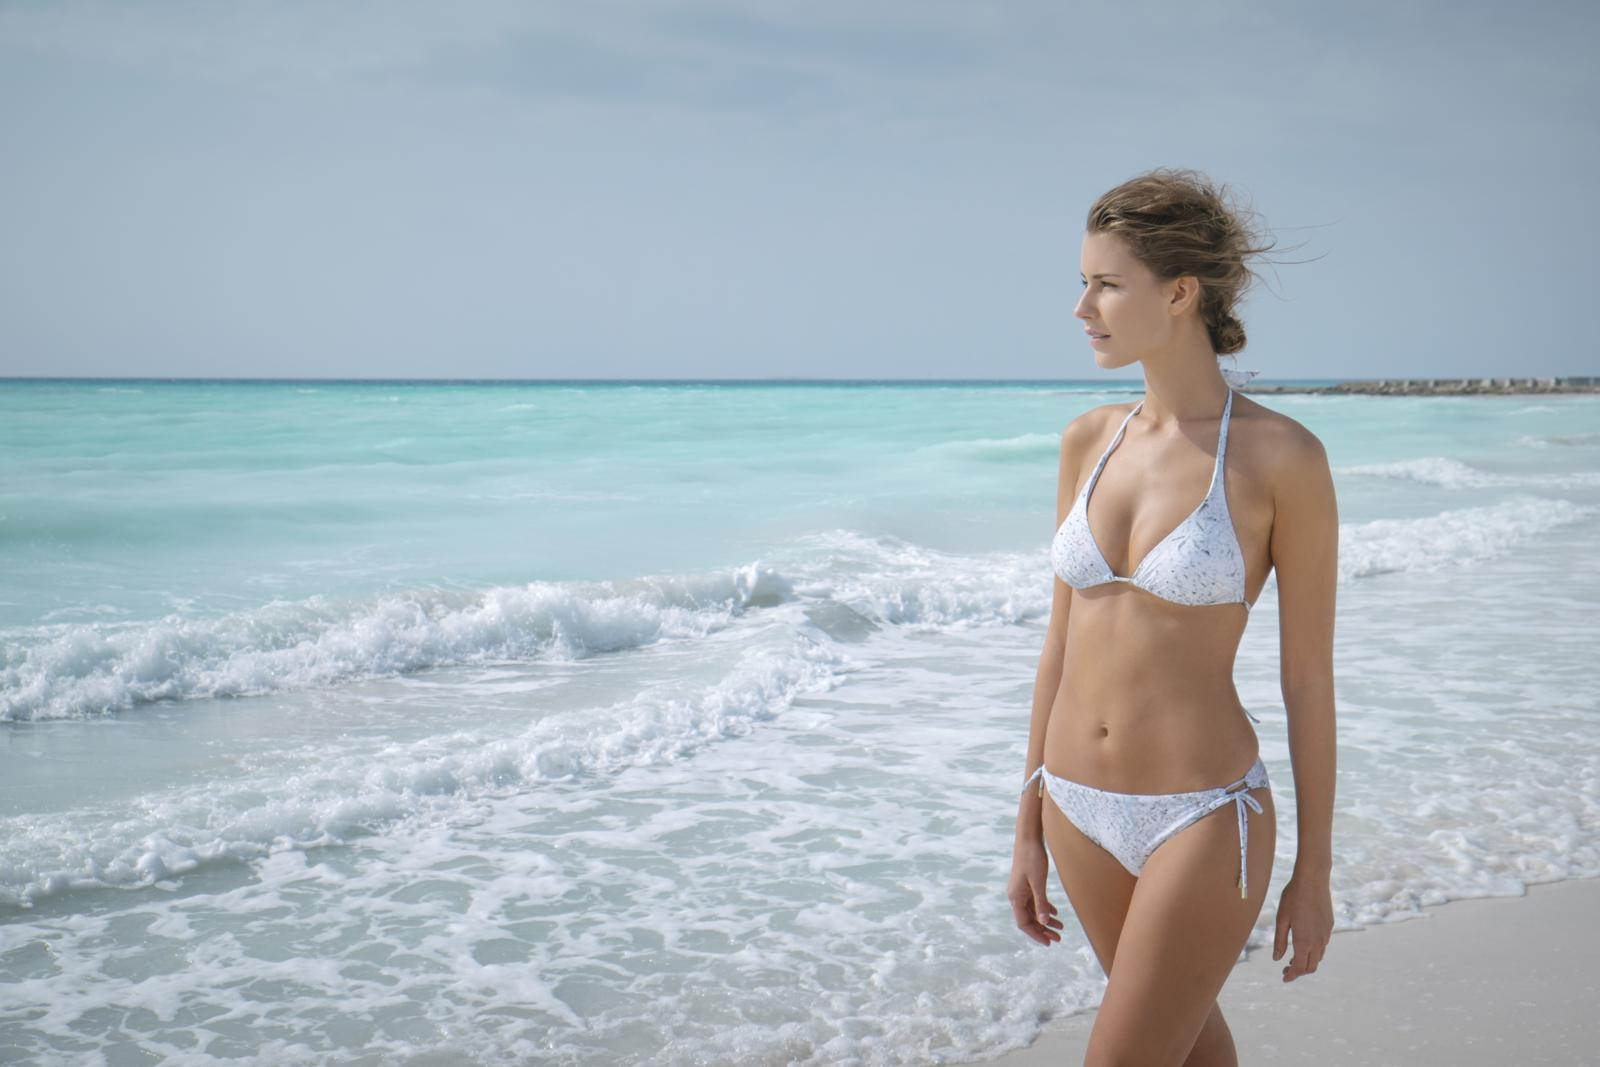 Anima Beachwear by Sophie Picard